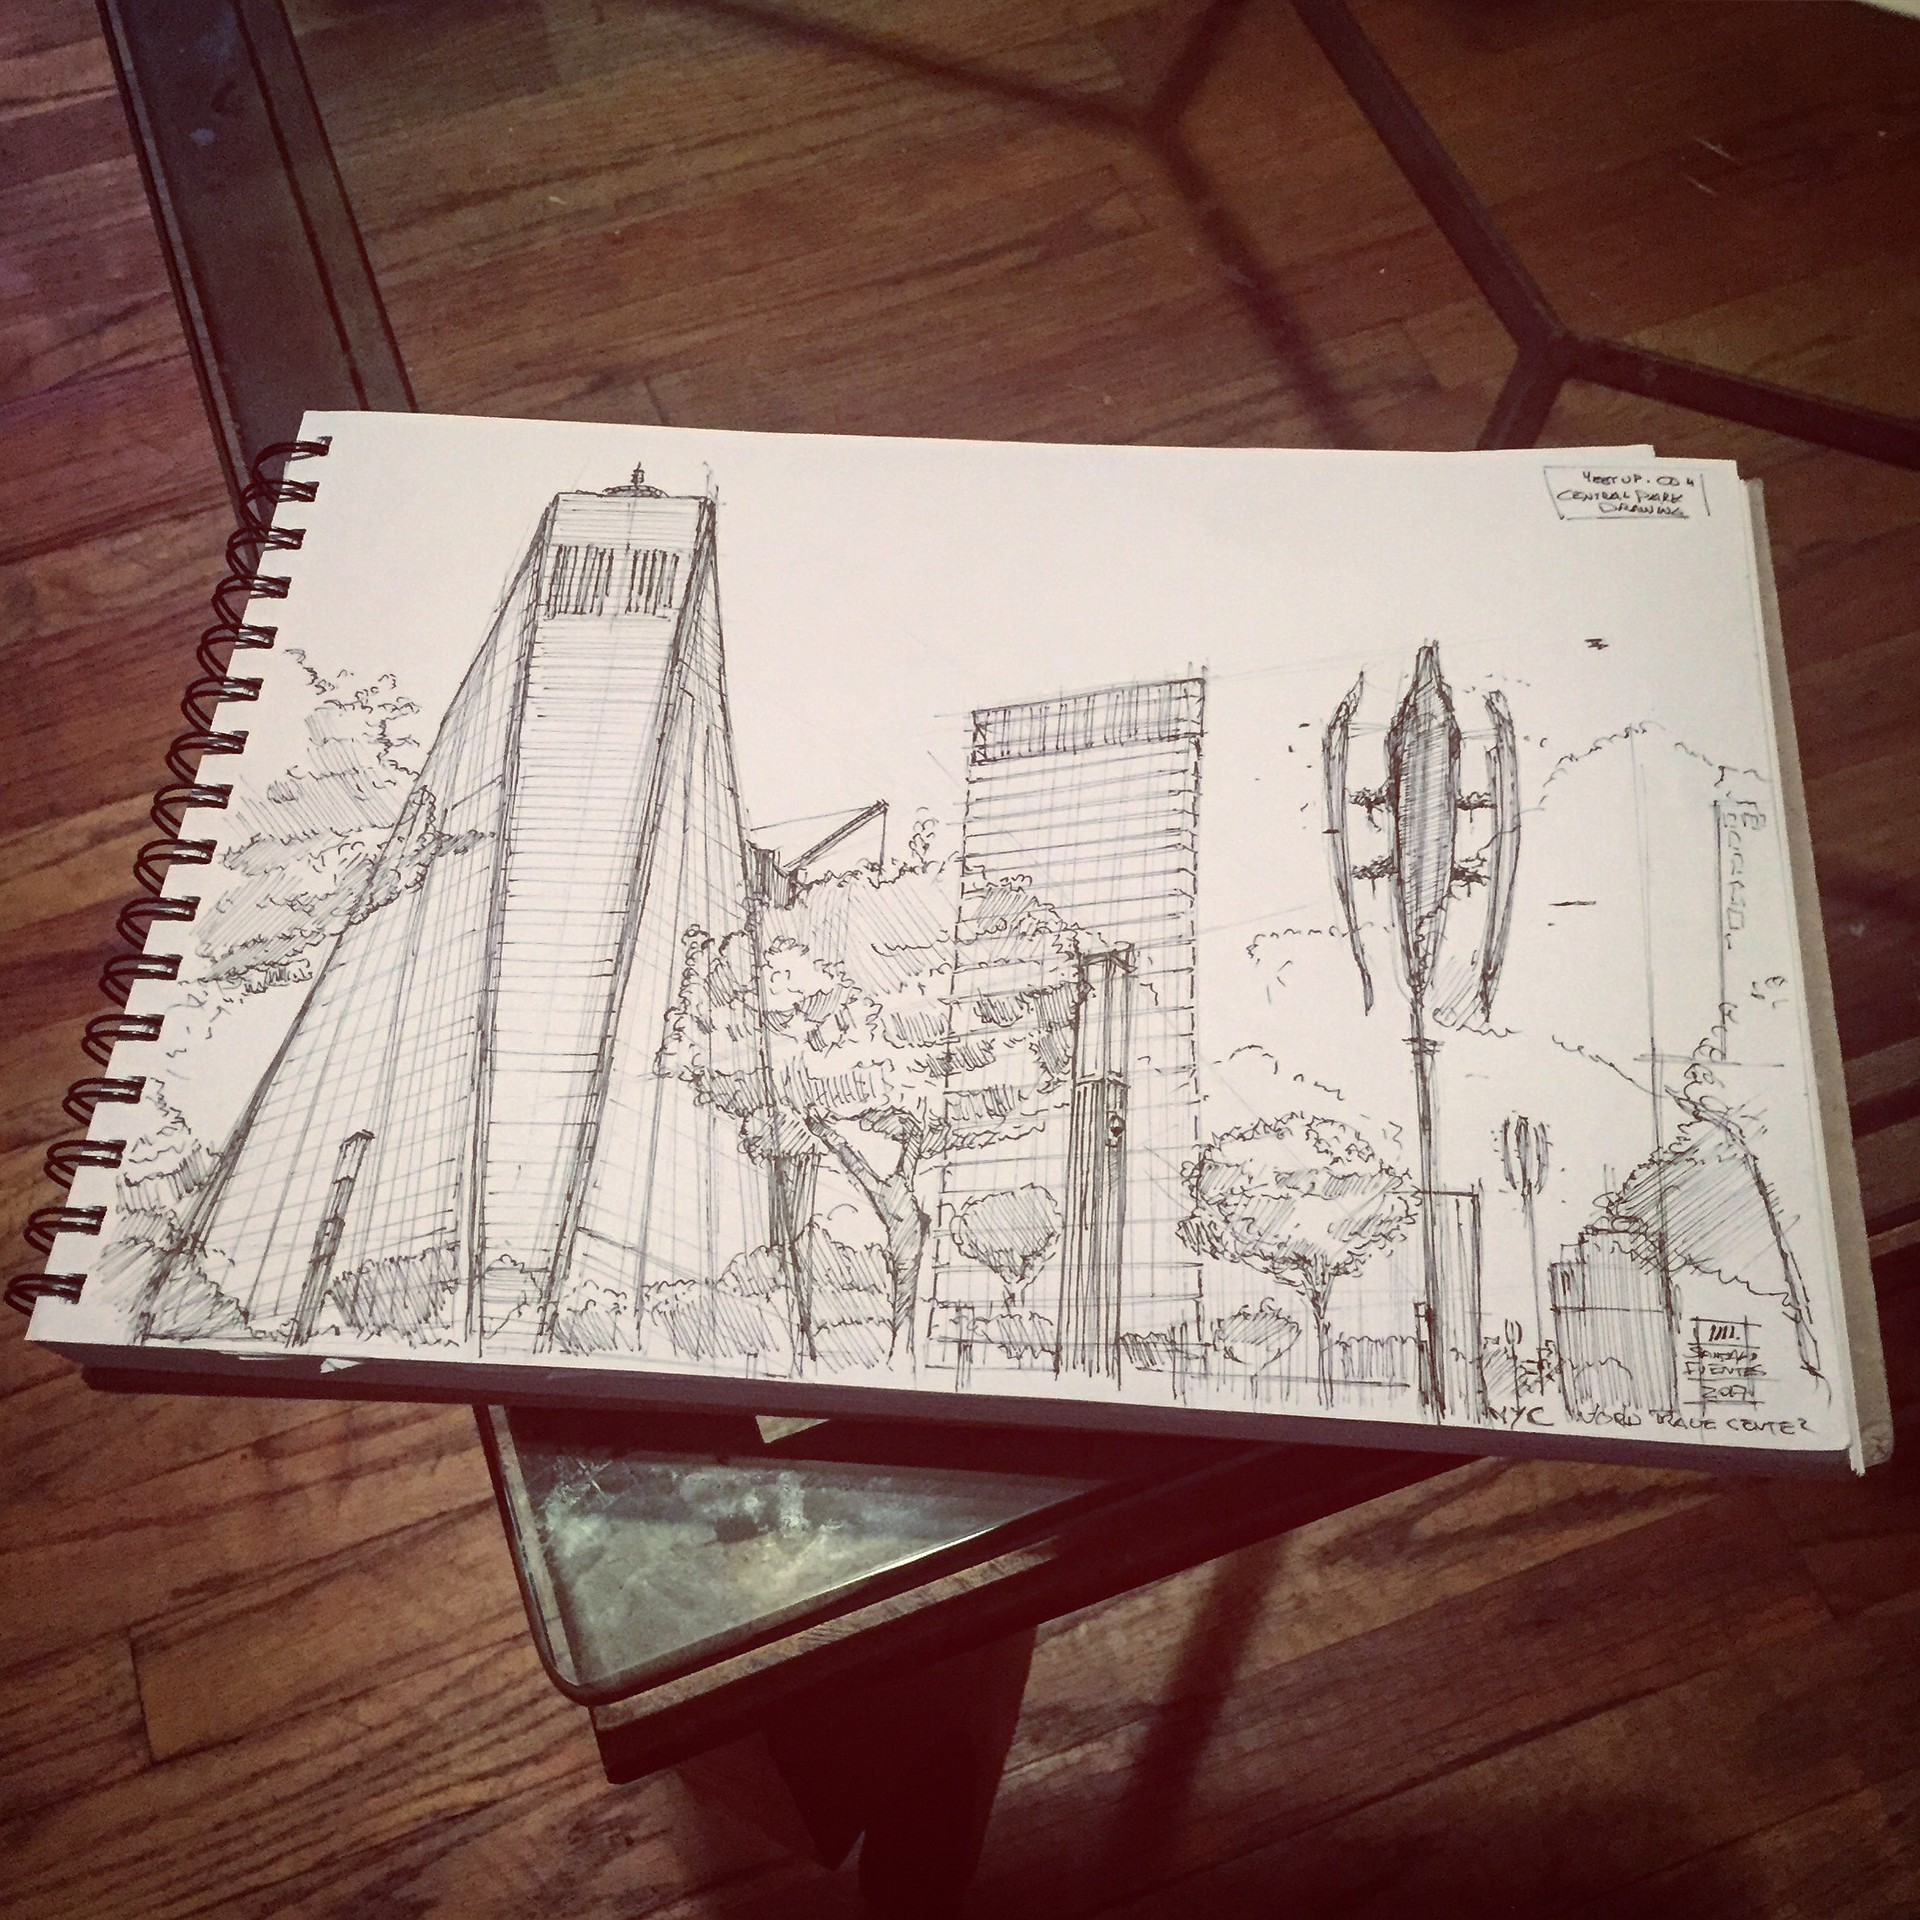 World Trade Center, NYC.